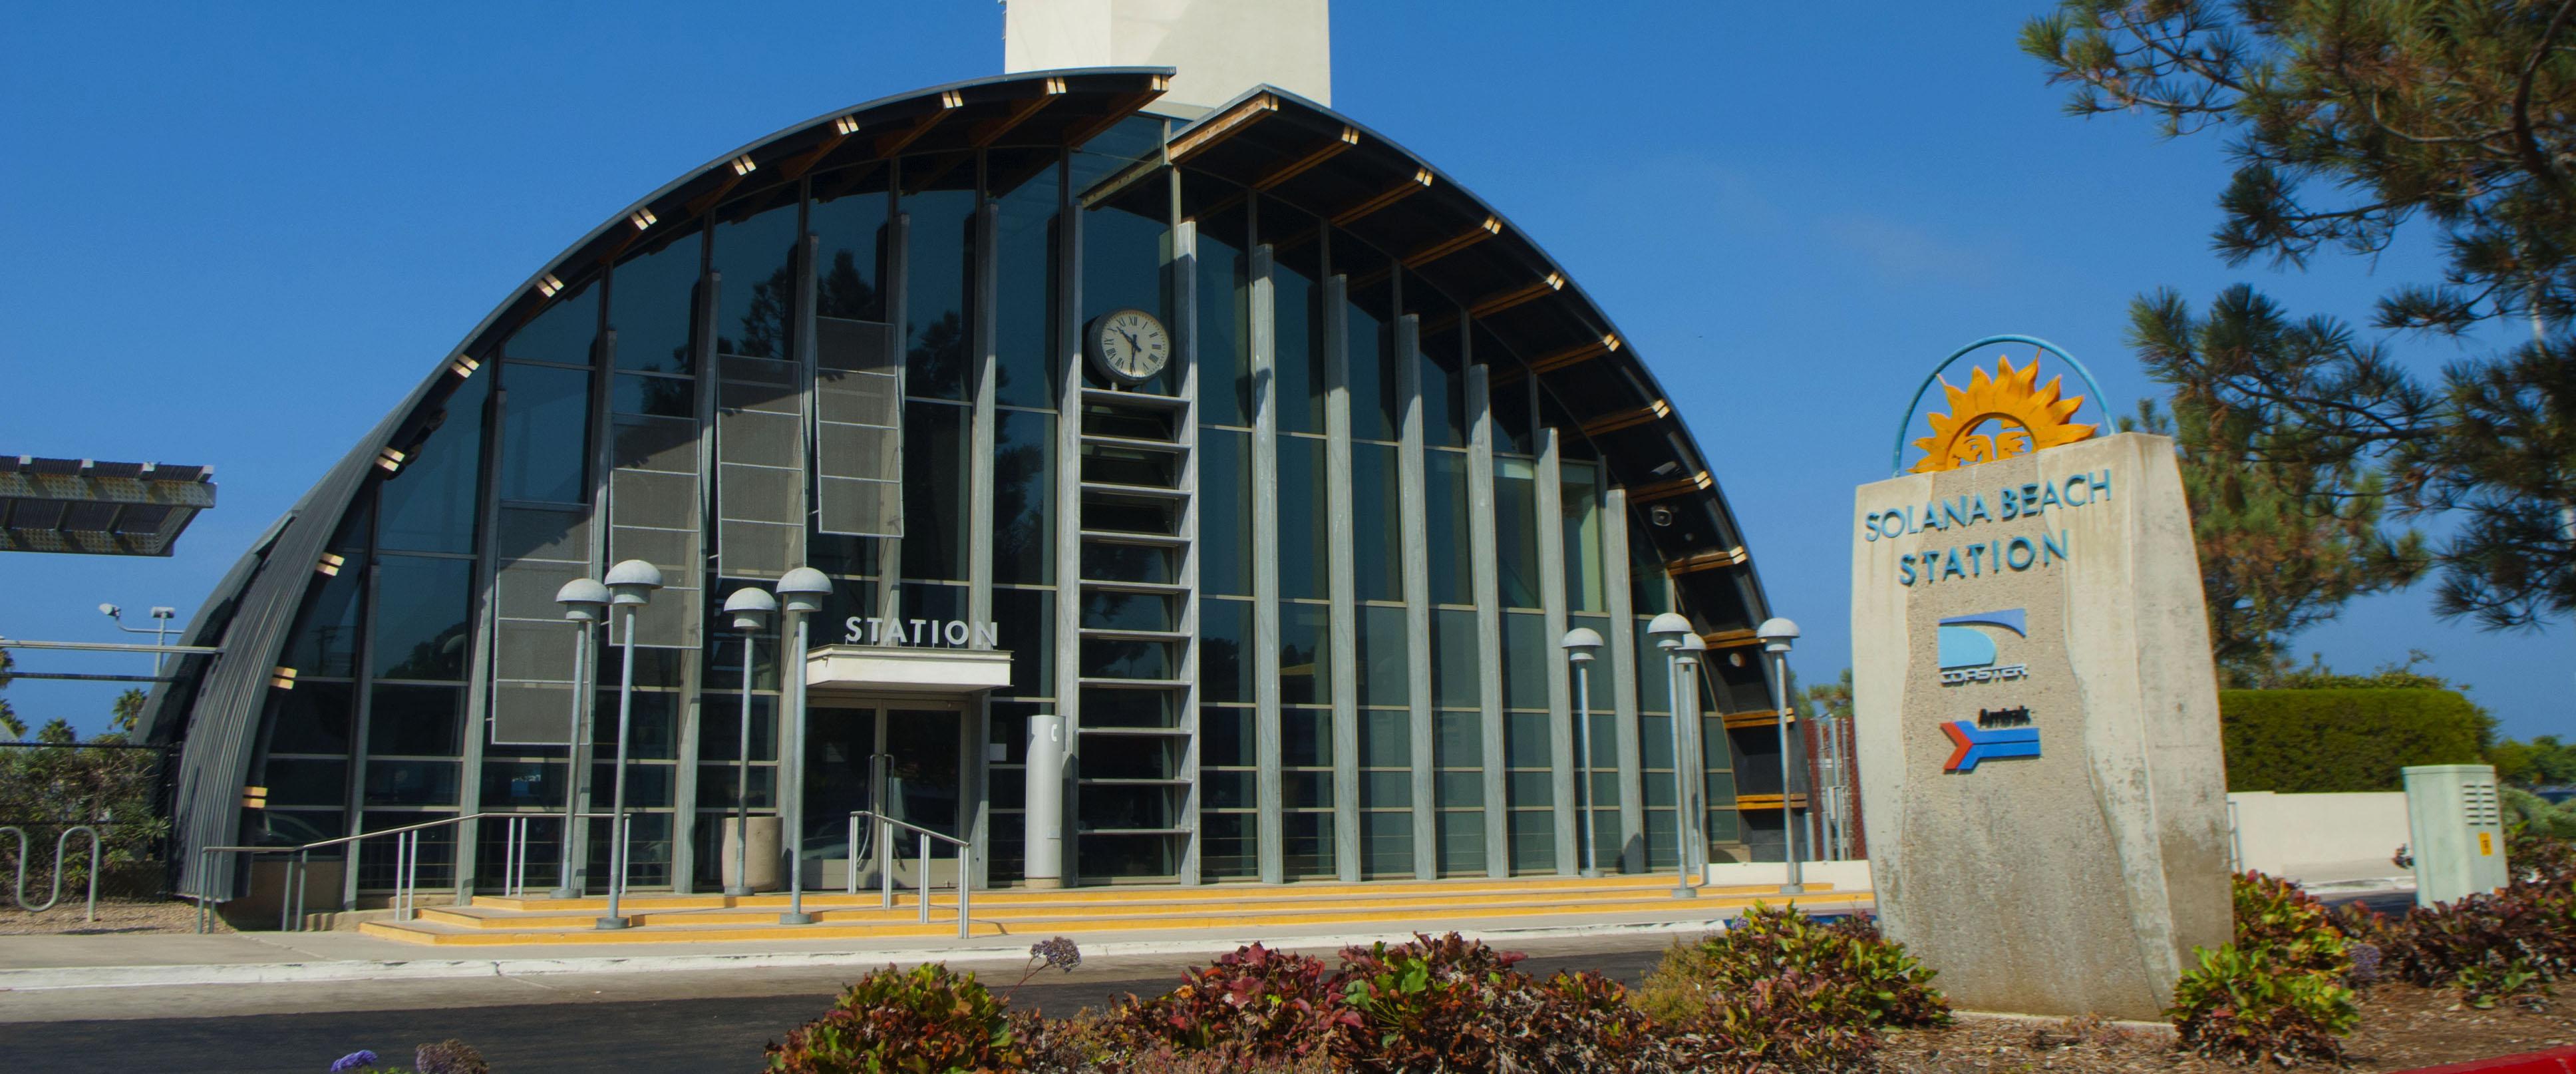 Solana Beach Train Station Restaurants